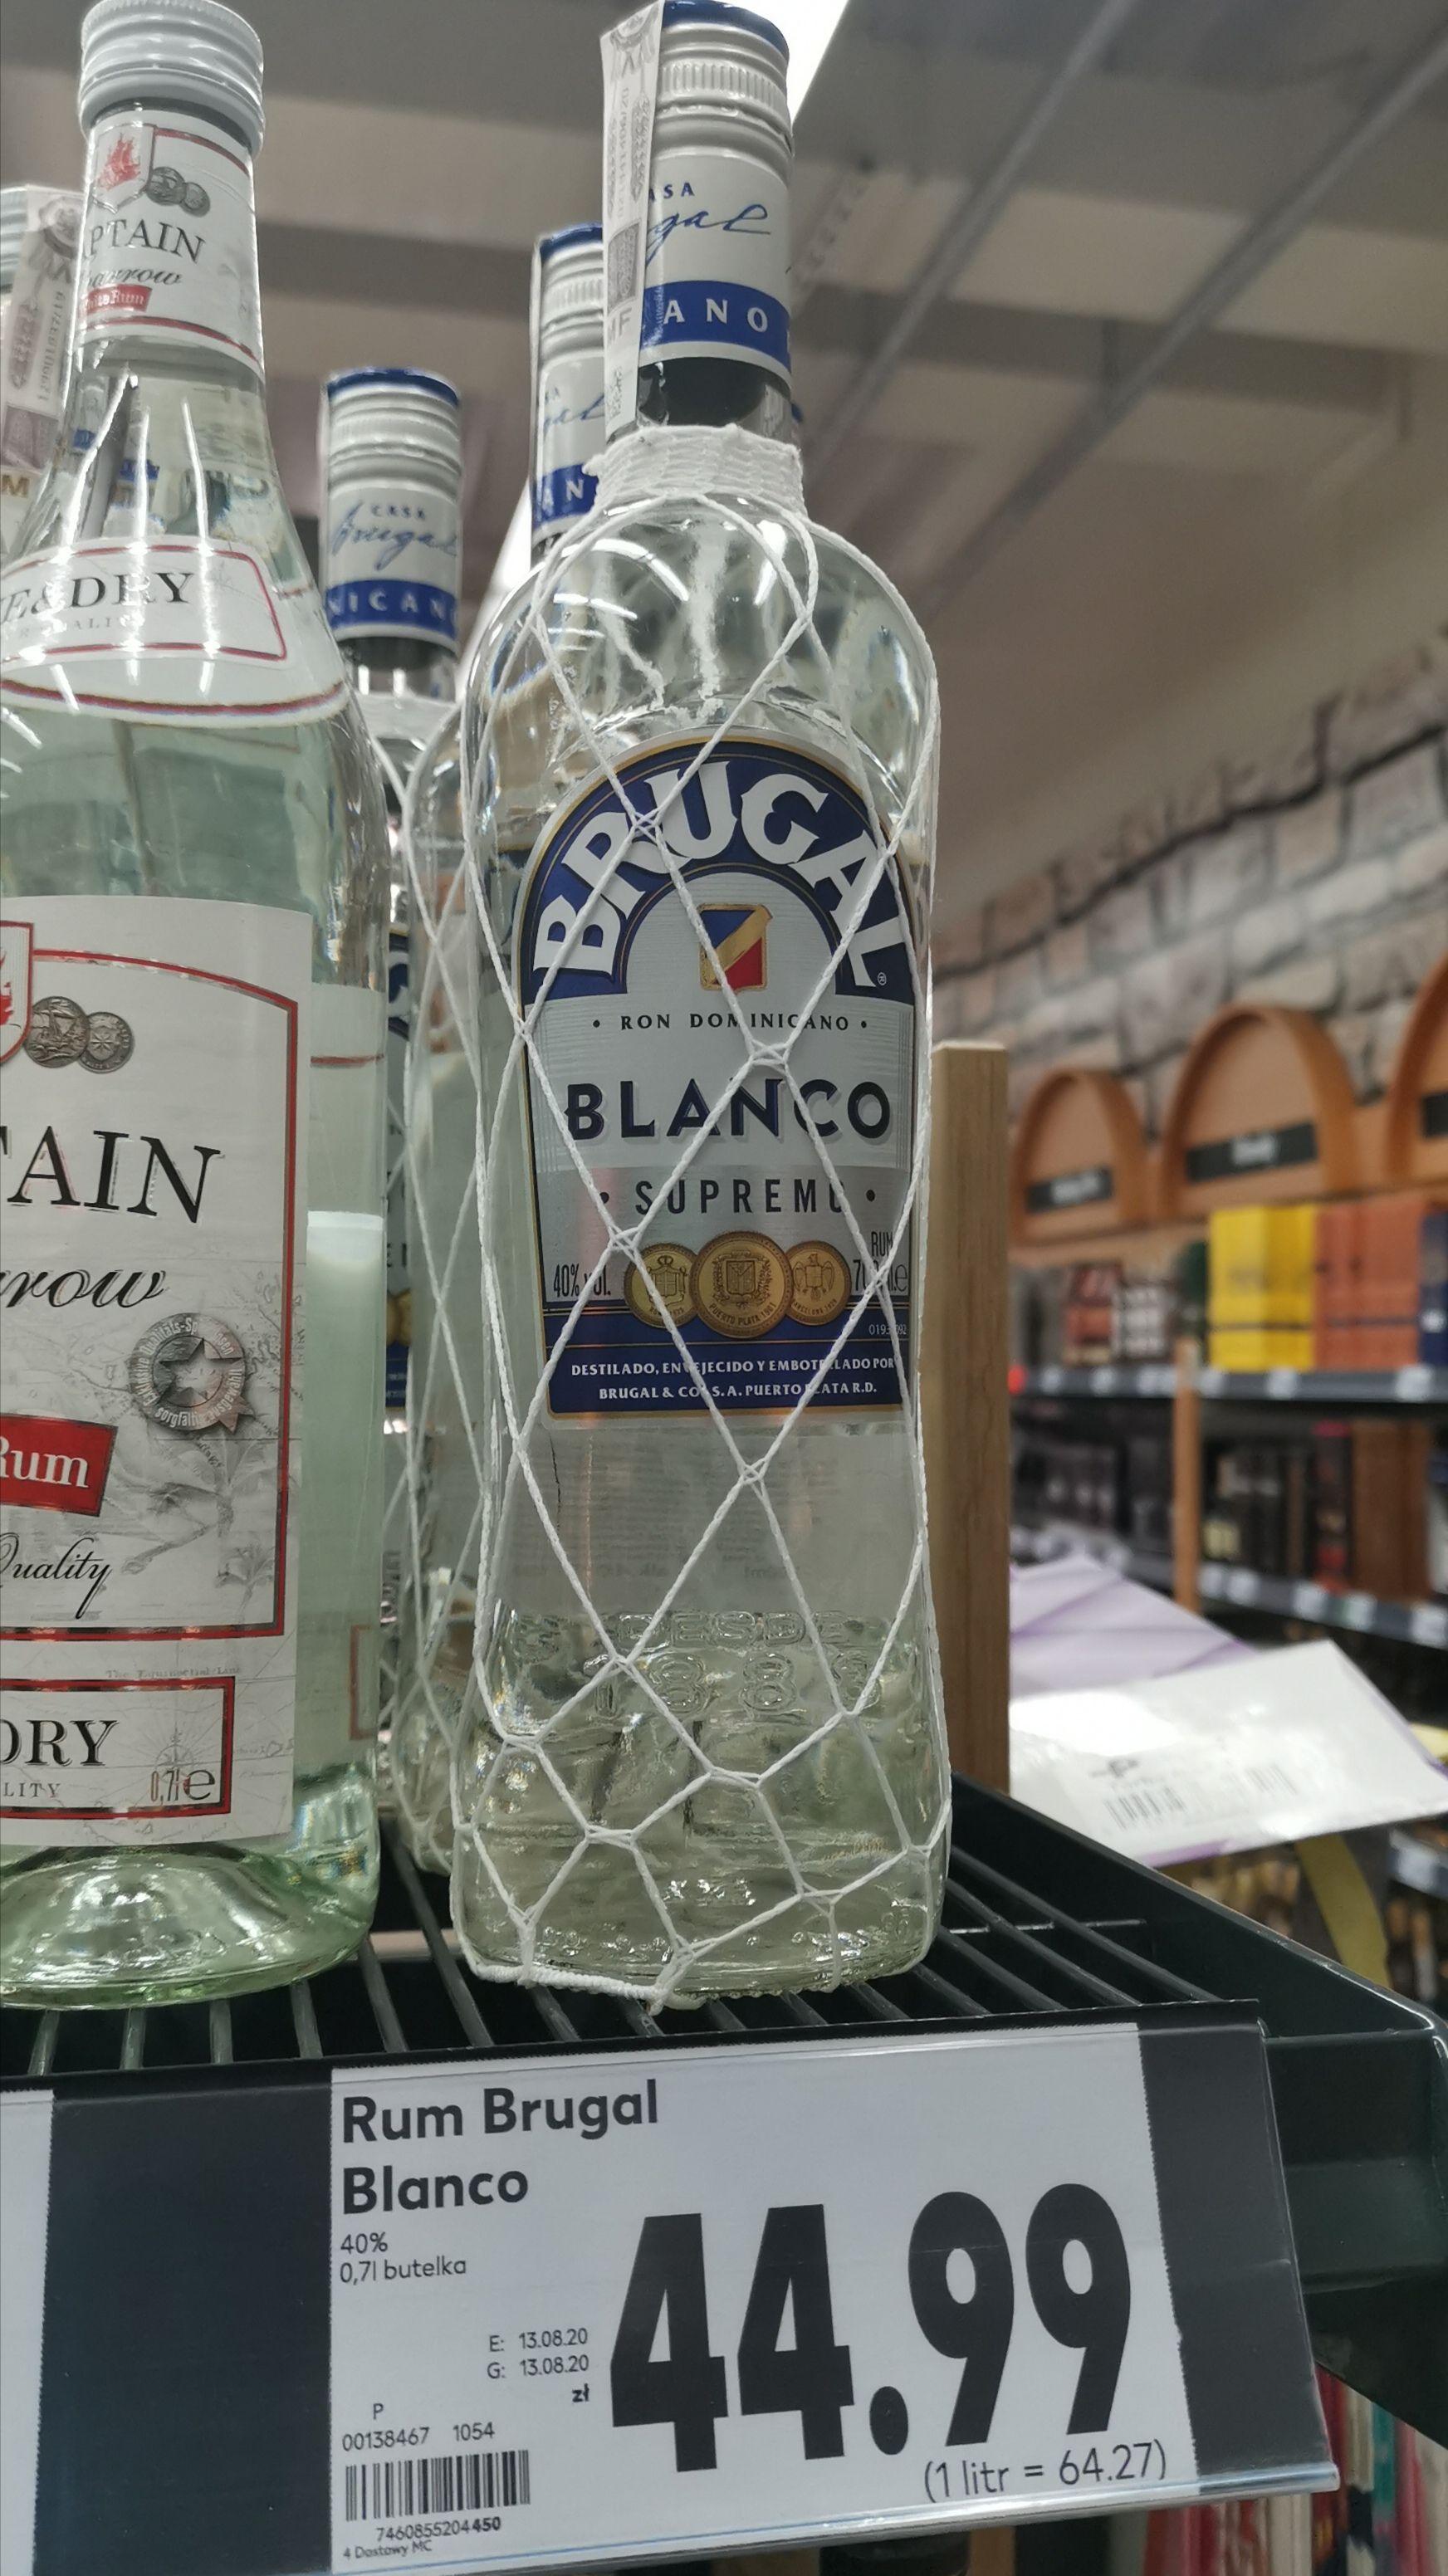 Rum BRUGAL BLANCO SUPREMO 0,7L Kaufland